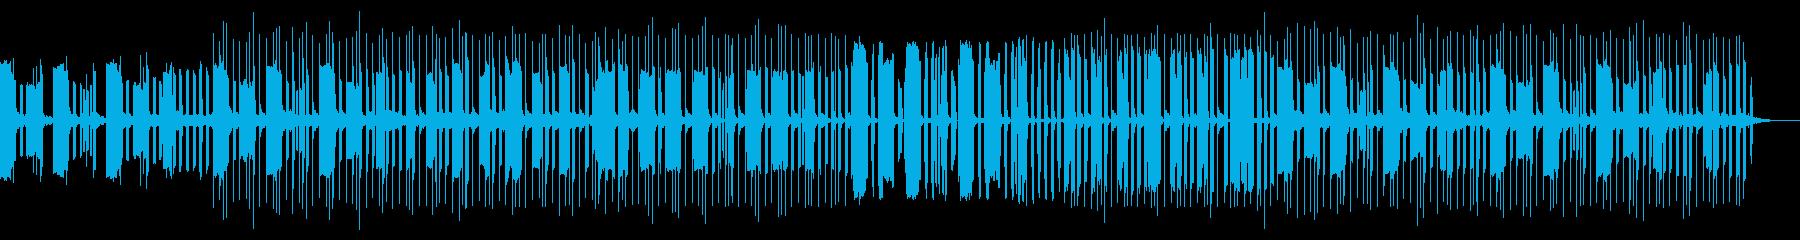 KANTほんわかBGM2010102の再生済みの波形